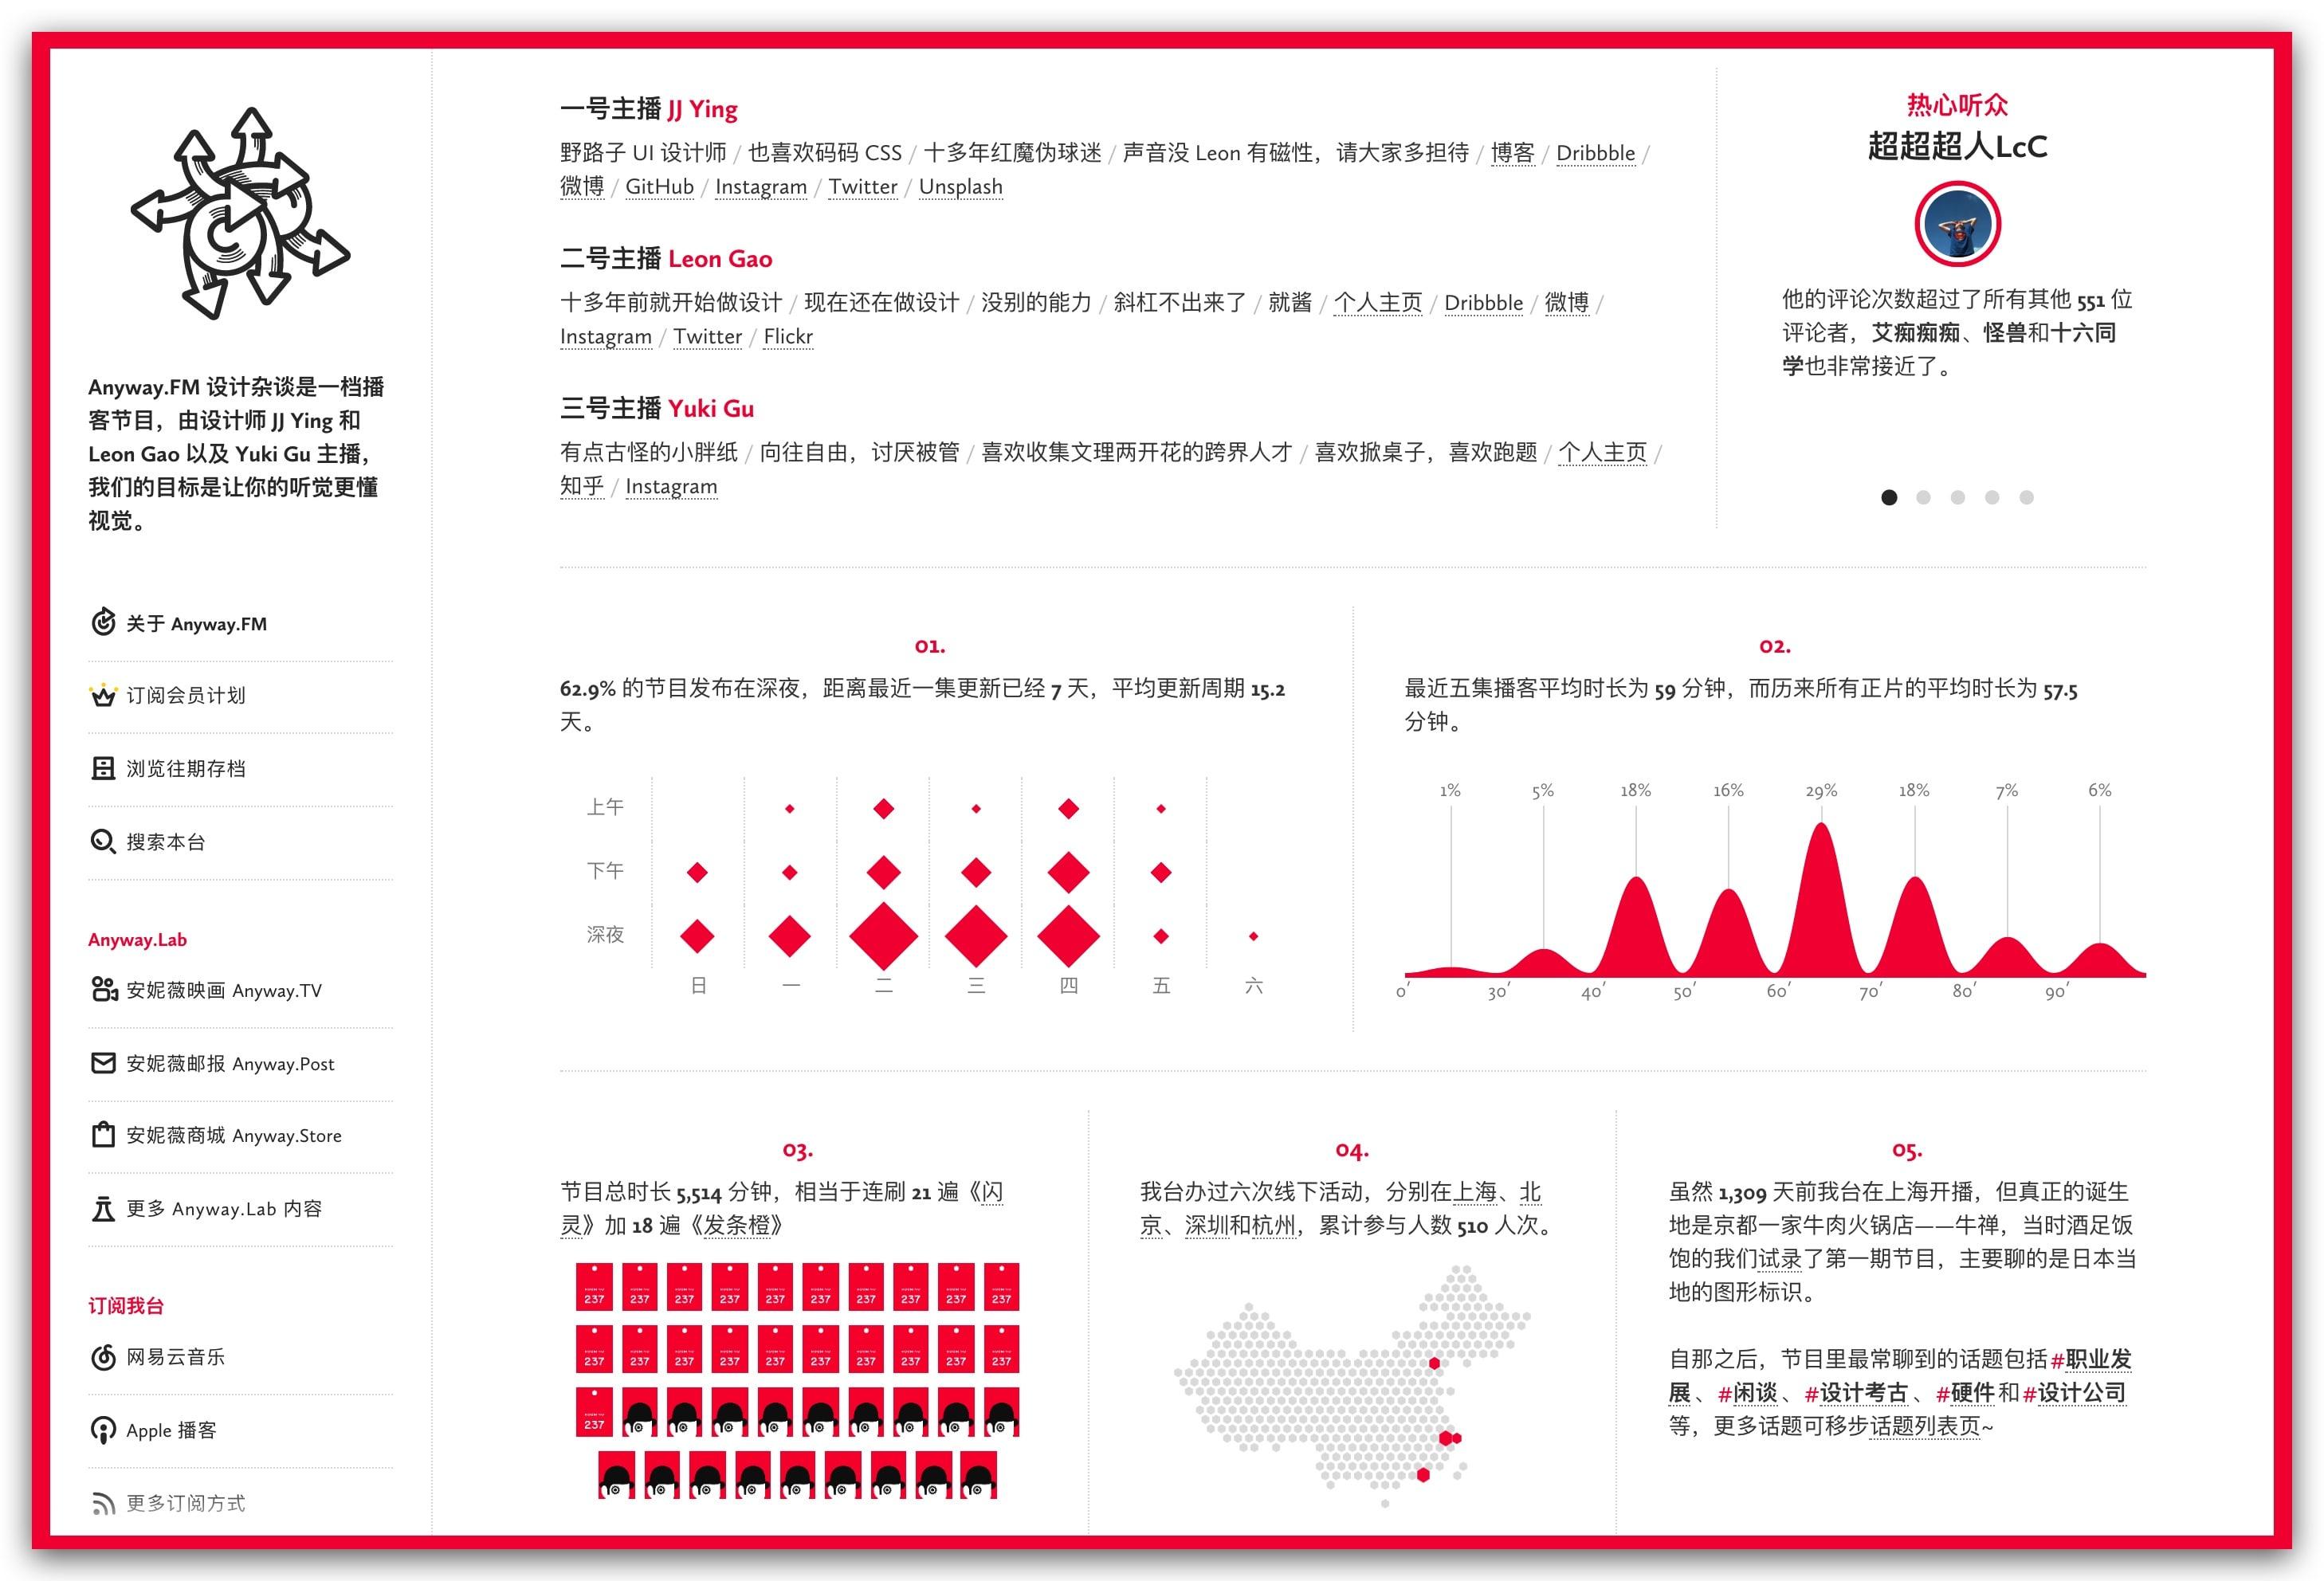 Xnip2019-05-30_00-40-38.jpg-411.3kB